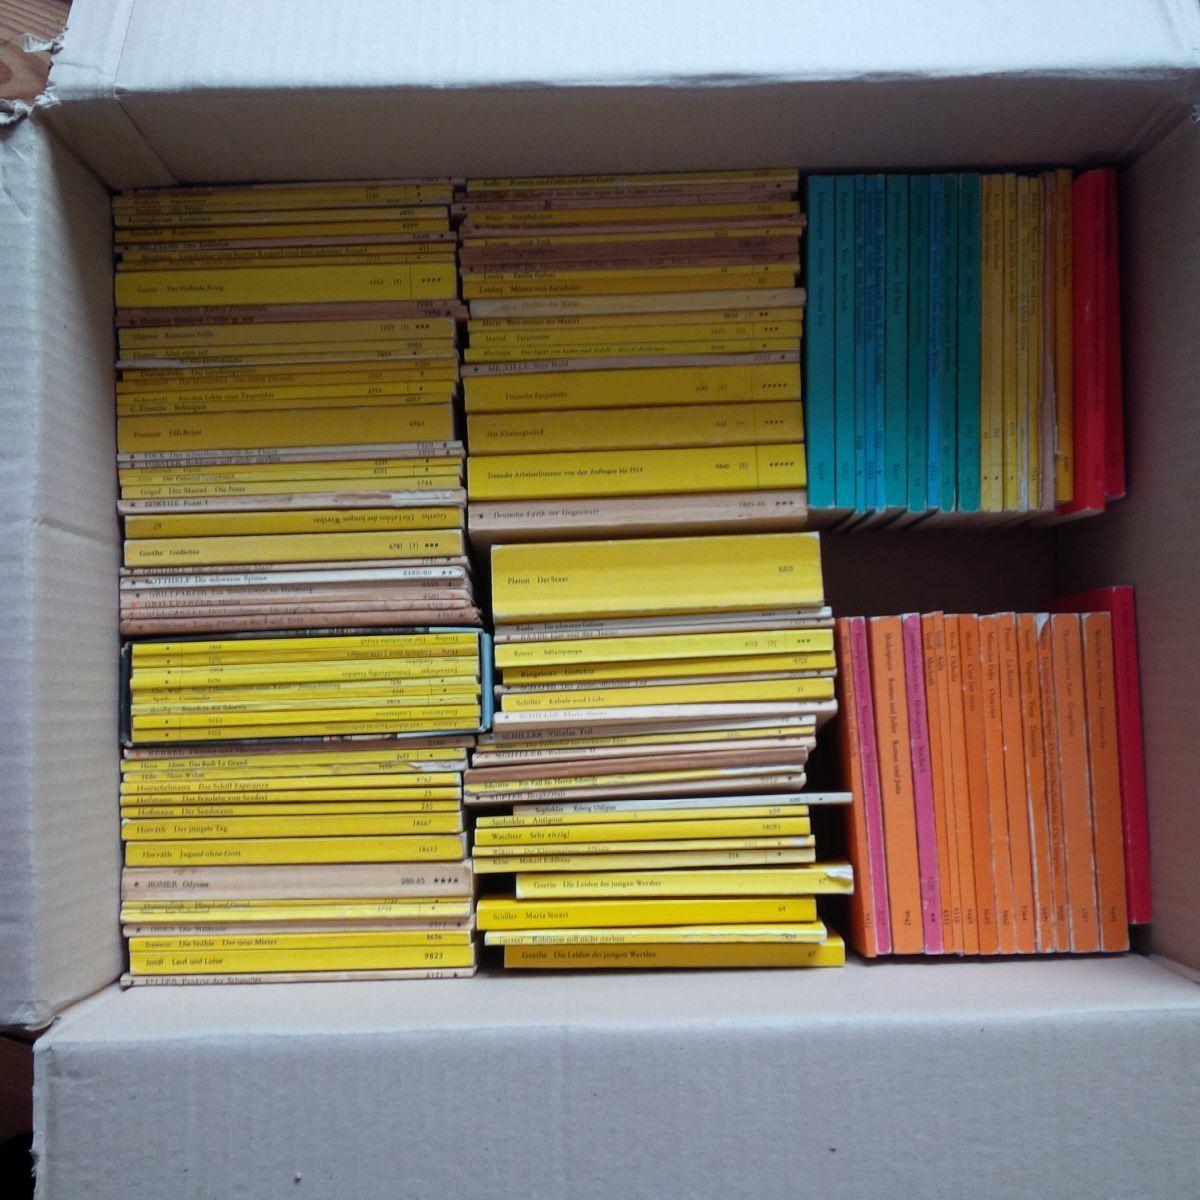 über 120 Reclam Hefte !! Konvolut !! Sammlung